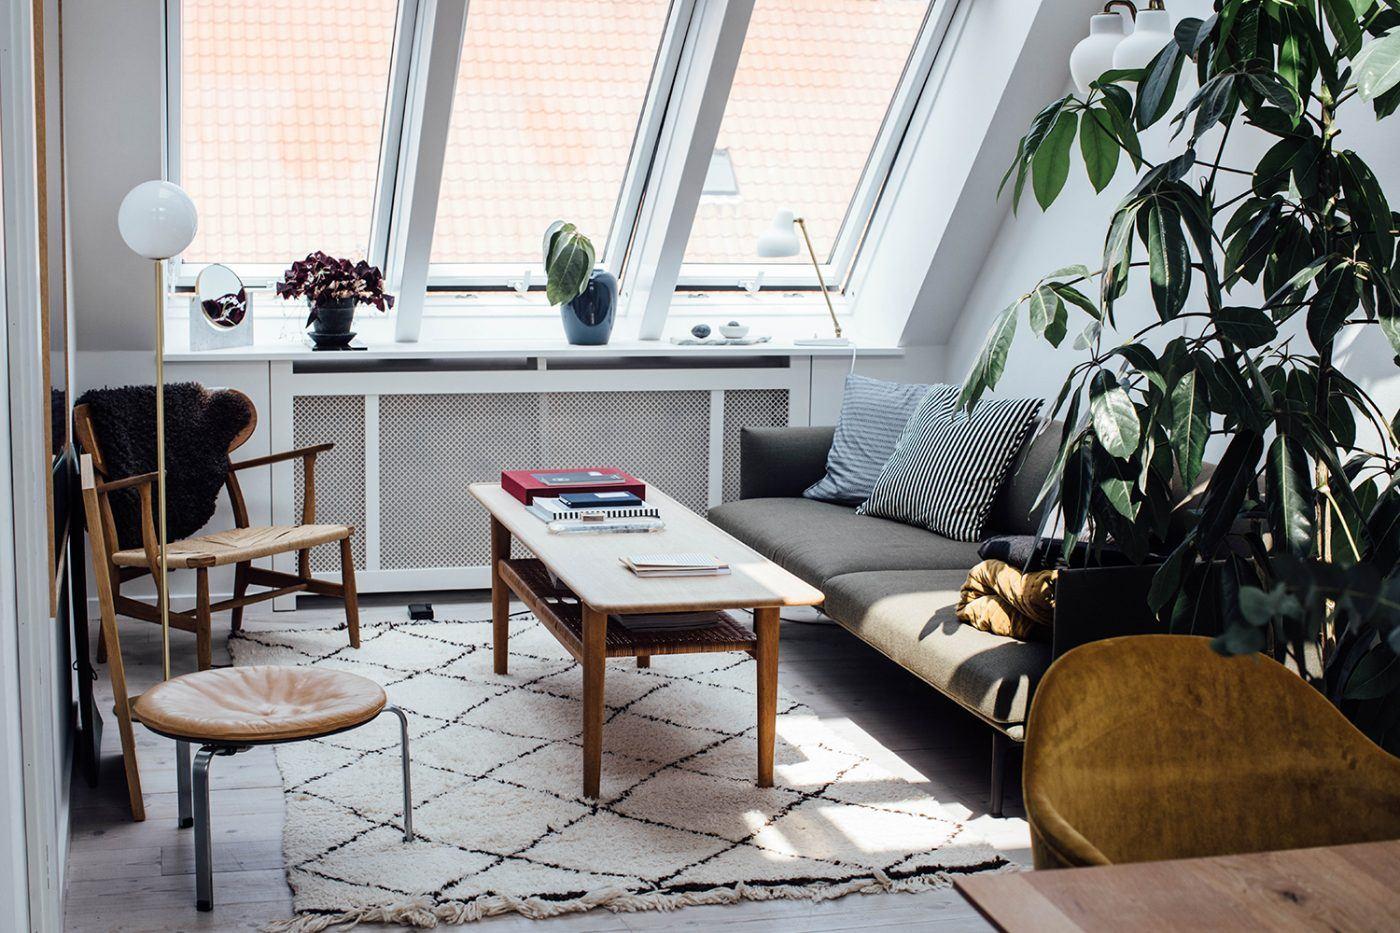 Image for Home Tour with Line Borella in Copenhagen